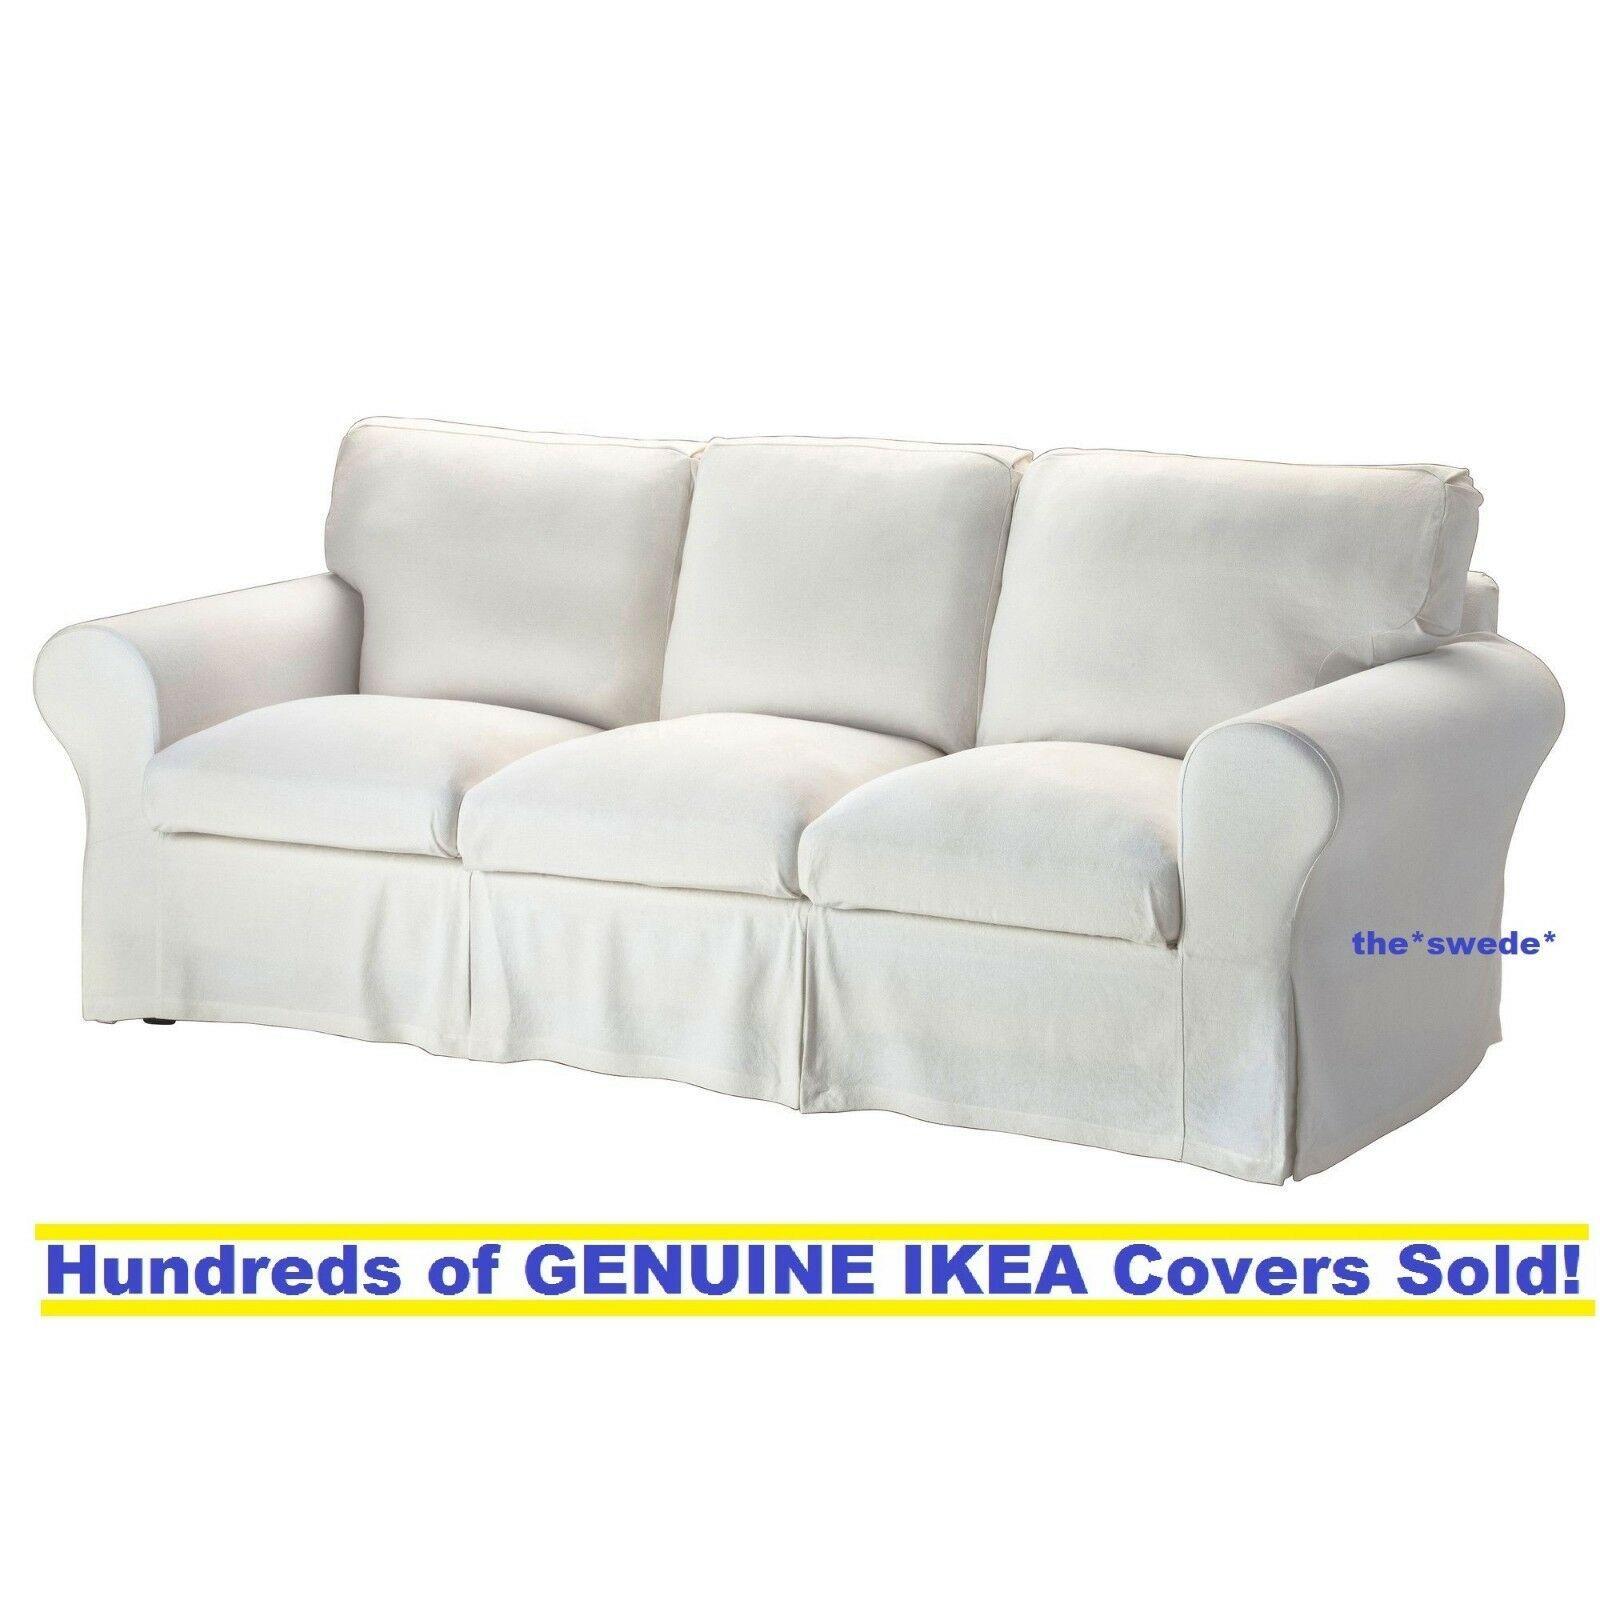 Ikea Ektorp Three 3 Seat Sofa Slipcover Cover Stenasa White New Sealed Ikea Sofa Ideas Of Ikea Sofa Sofa Ikea In 2020 Ikea Sofa Ikea Ektorp Slipcovered Sofa